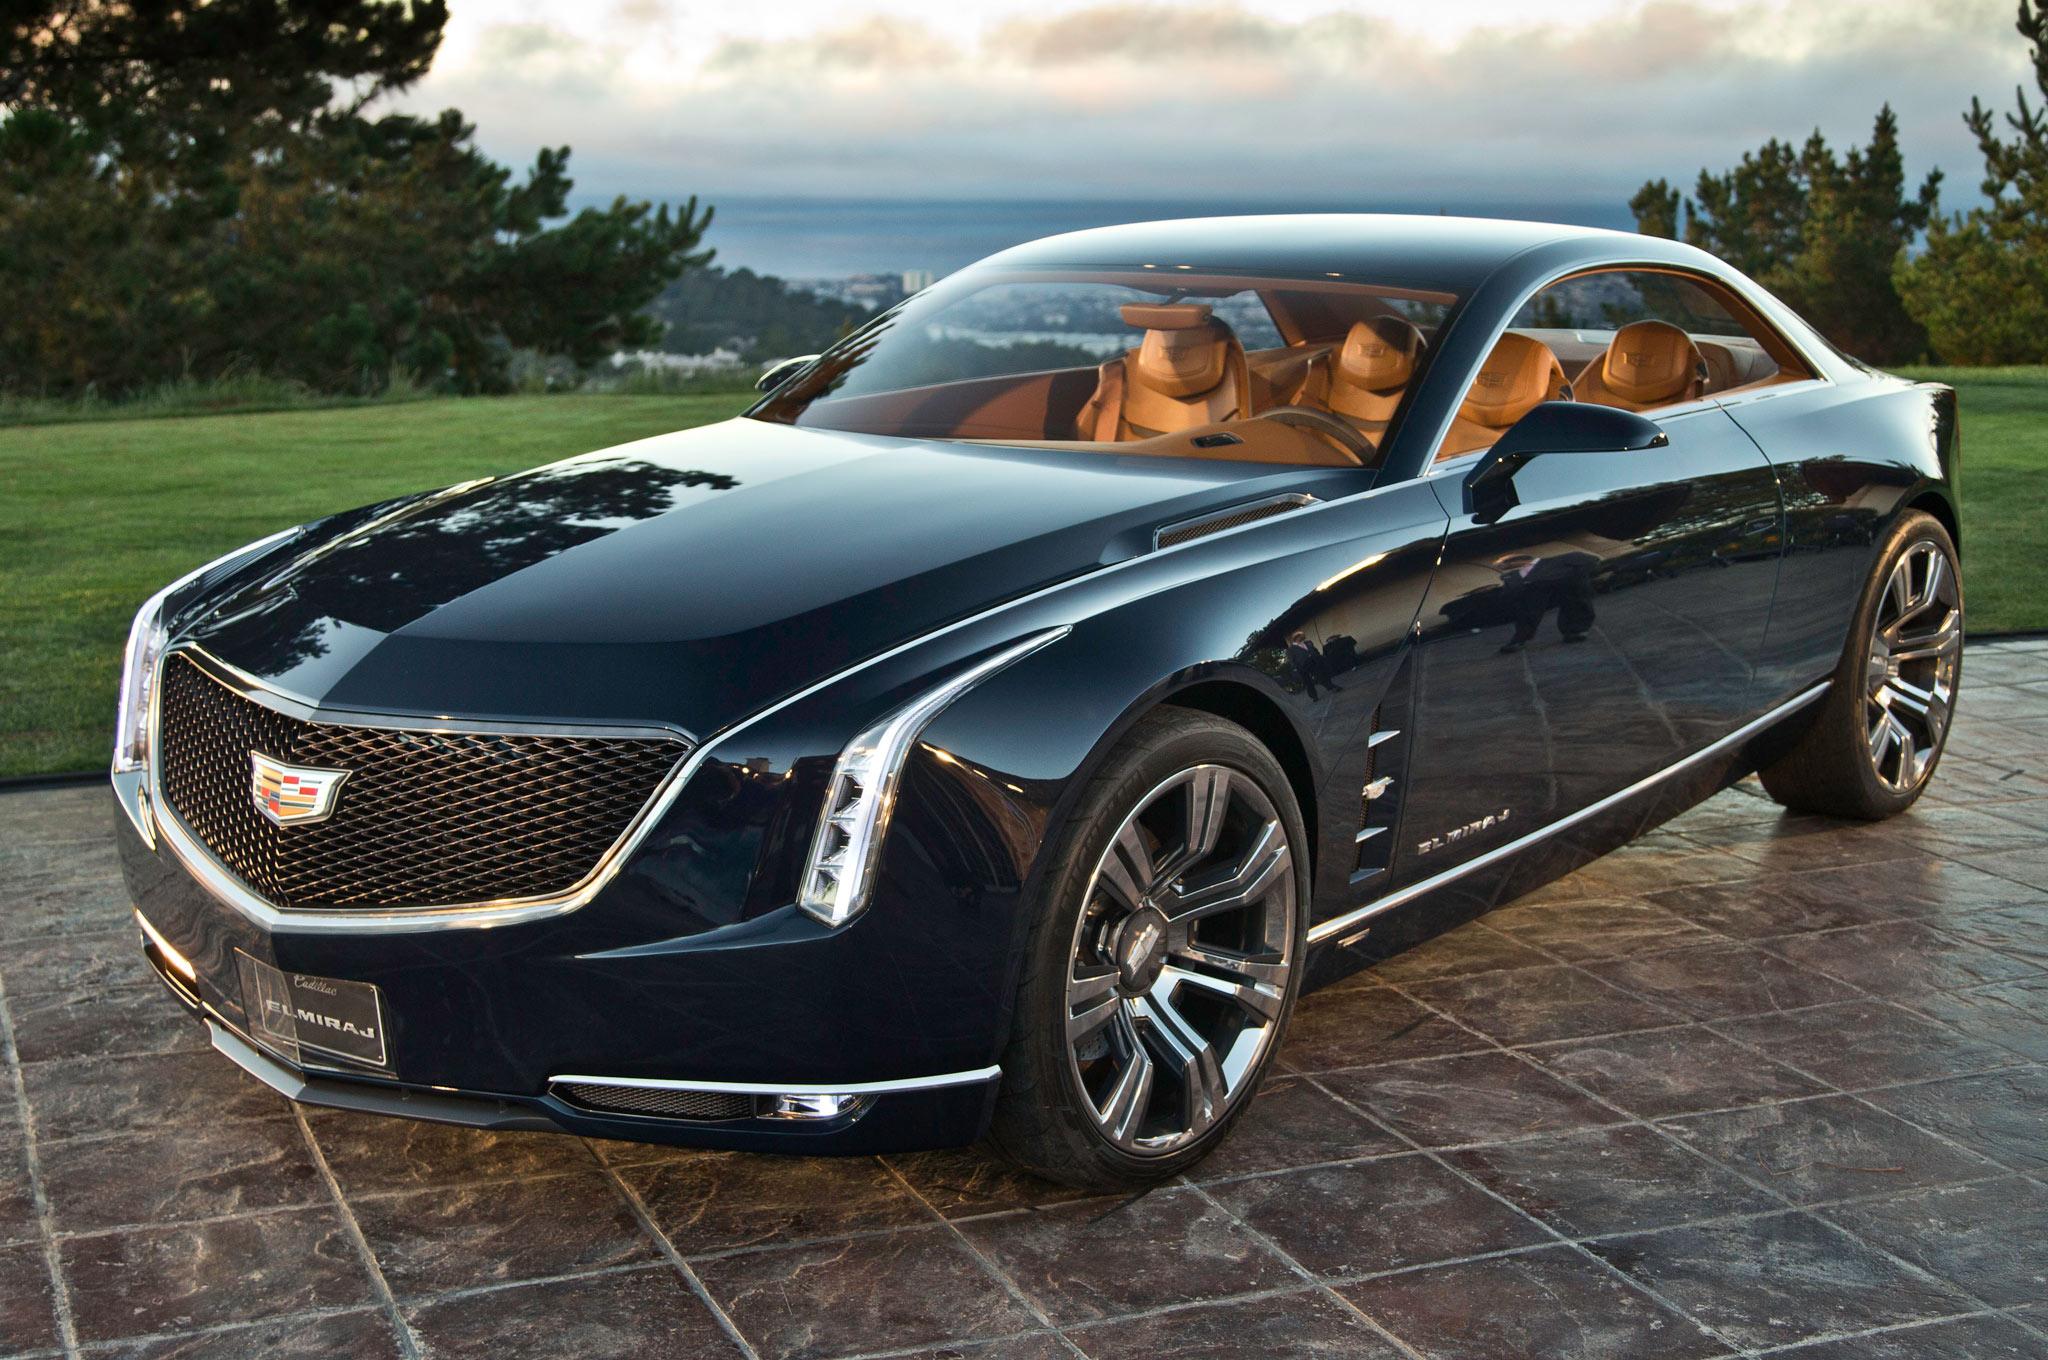 Cadillac Elmiraj Price >> 2013 Cadillac Elmiraj Concept Revealed At Pebble Beach Automobile